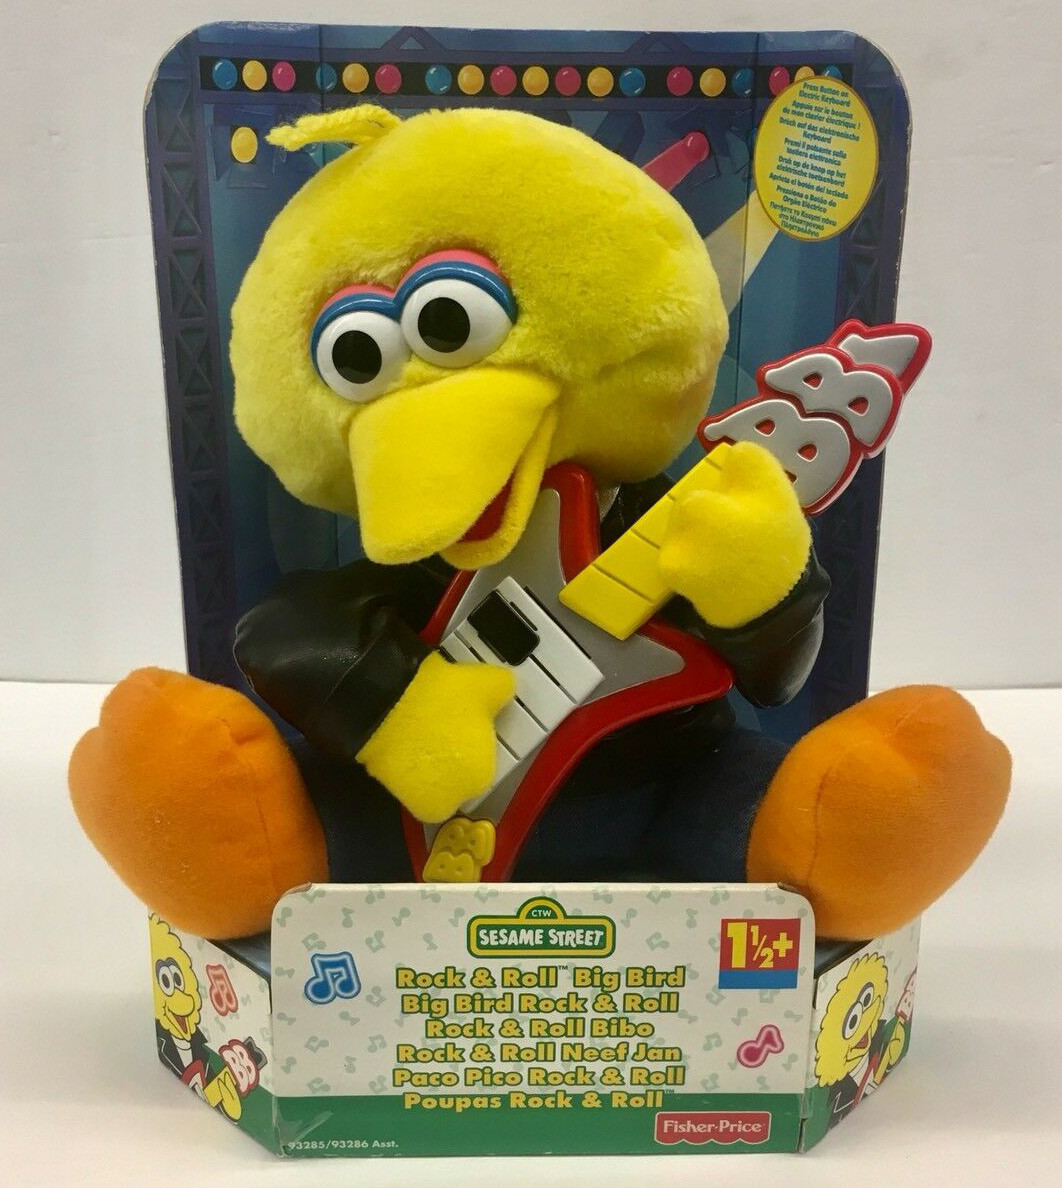 File:Rock&RollBigBirdTyco1999.jpg